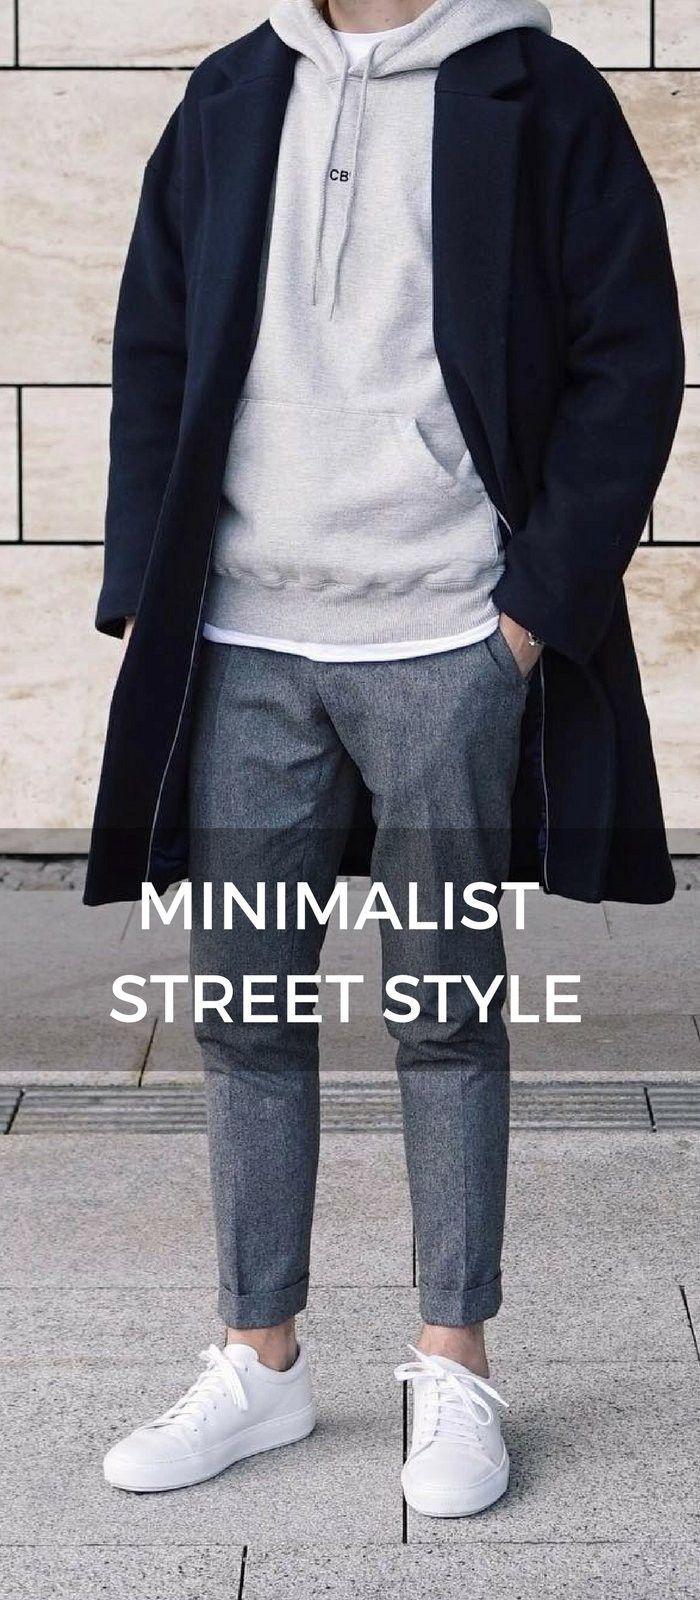 15 Winter Looks For Minimalist